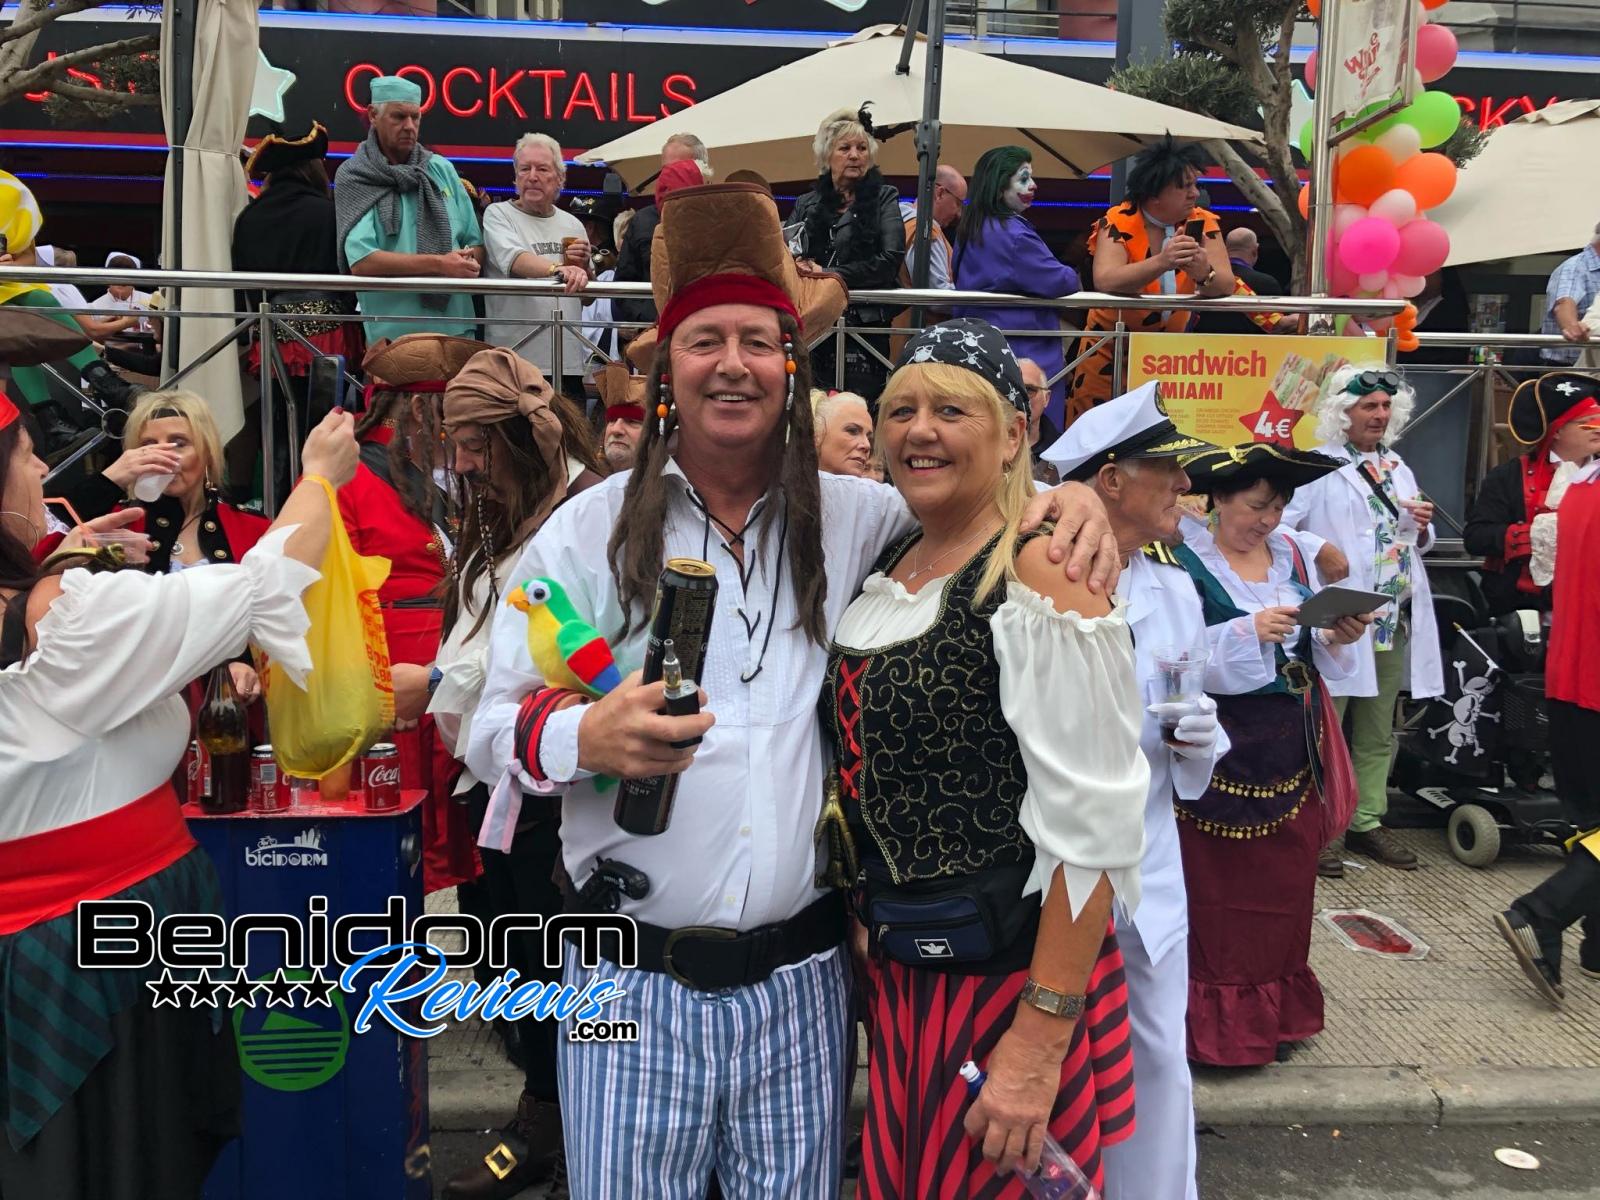 Benidorm-Fiestas-2019-Fancy-Dress-236